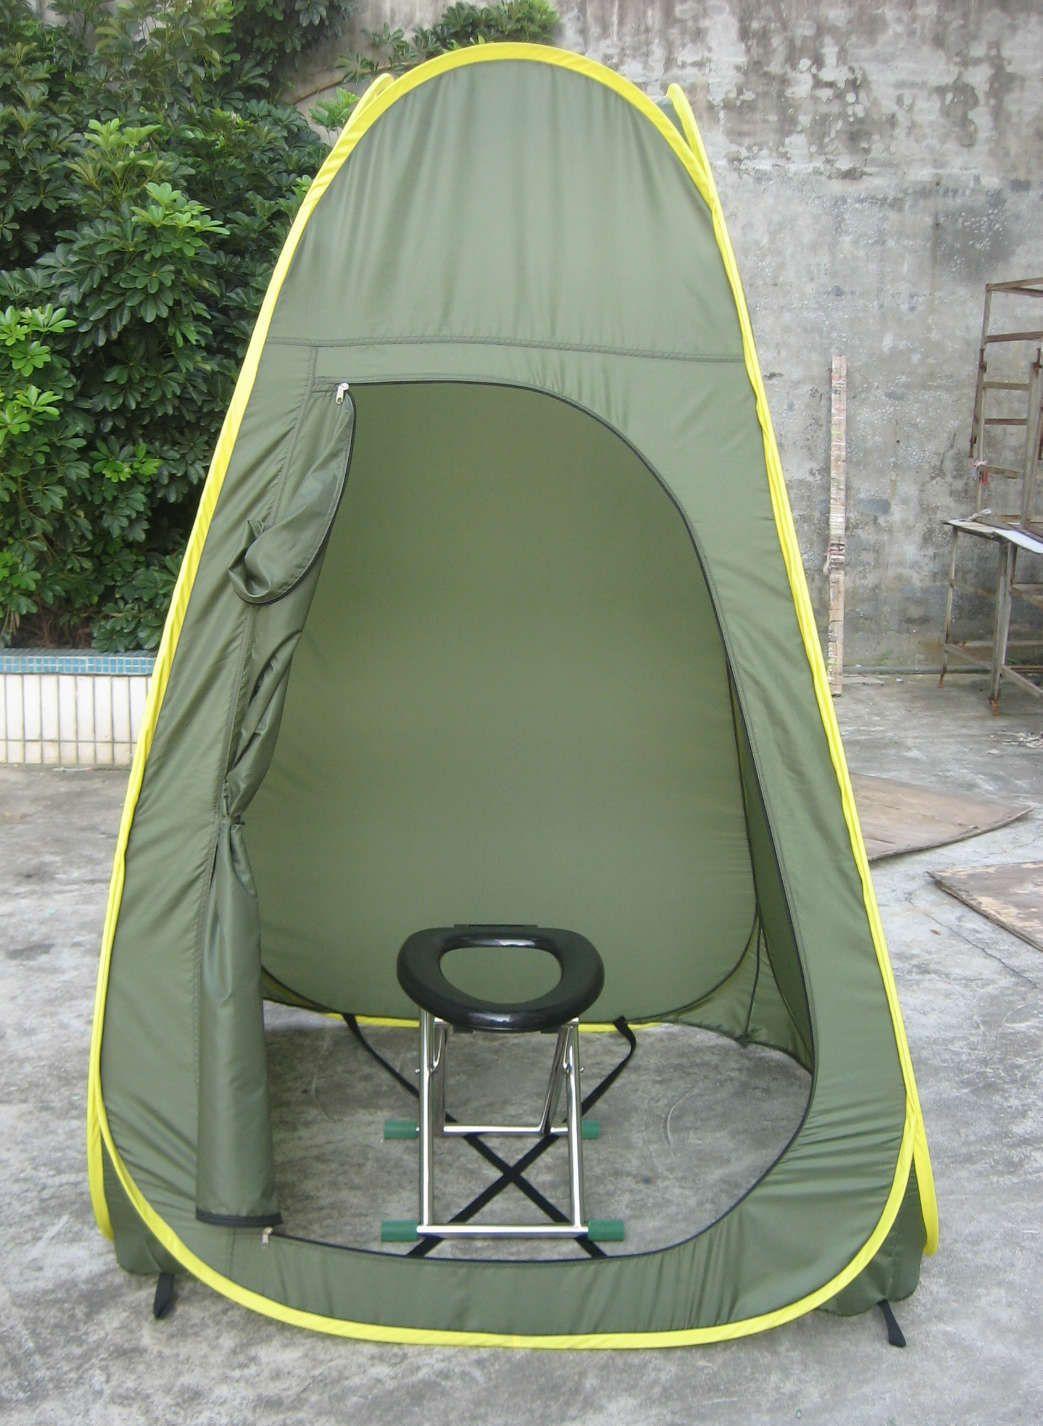 Toilet Tent Portable Privacy Shelter Life Changing Products destiné Toilette Portative Canadian Tire